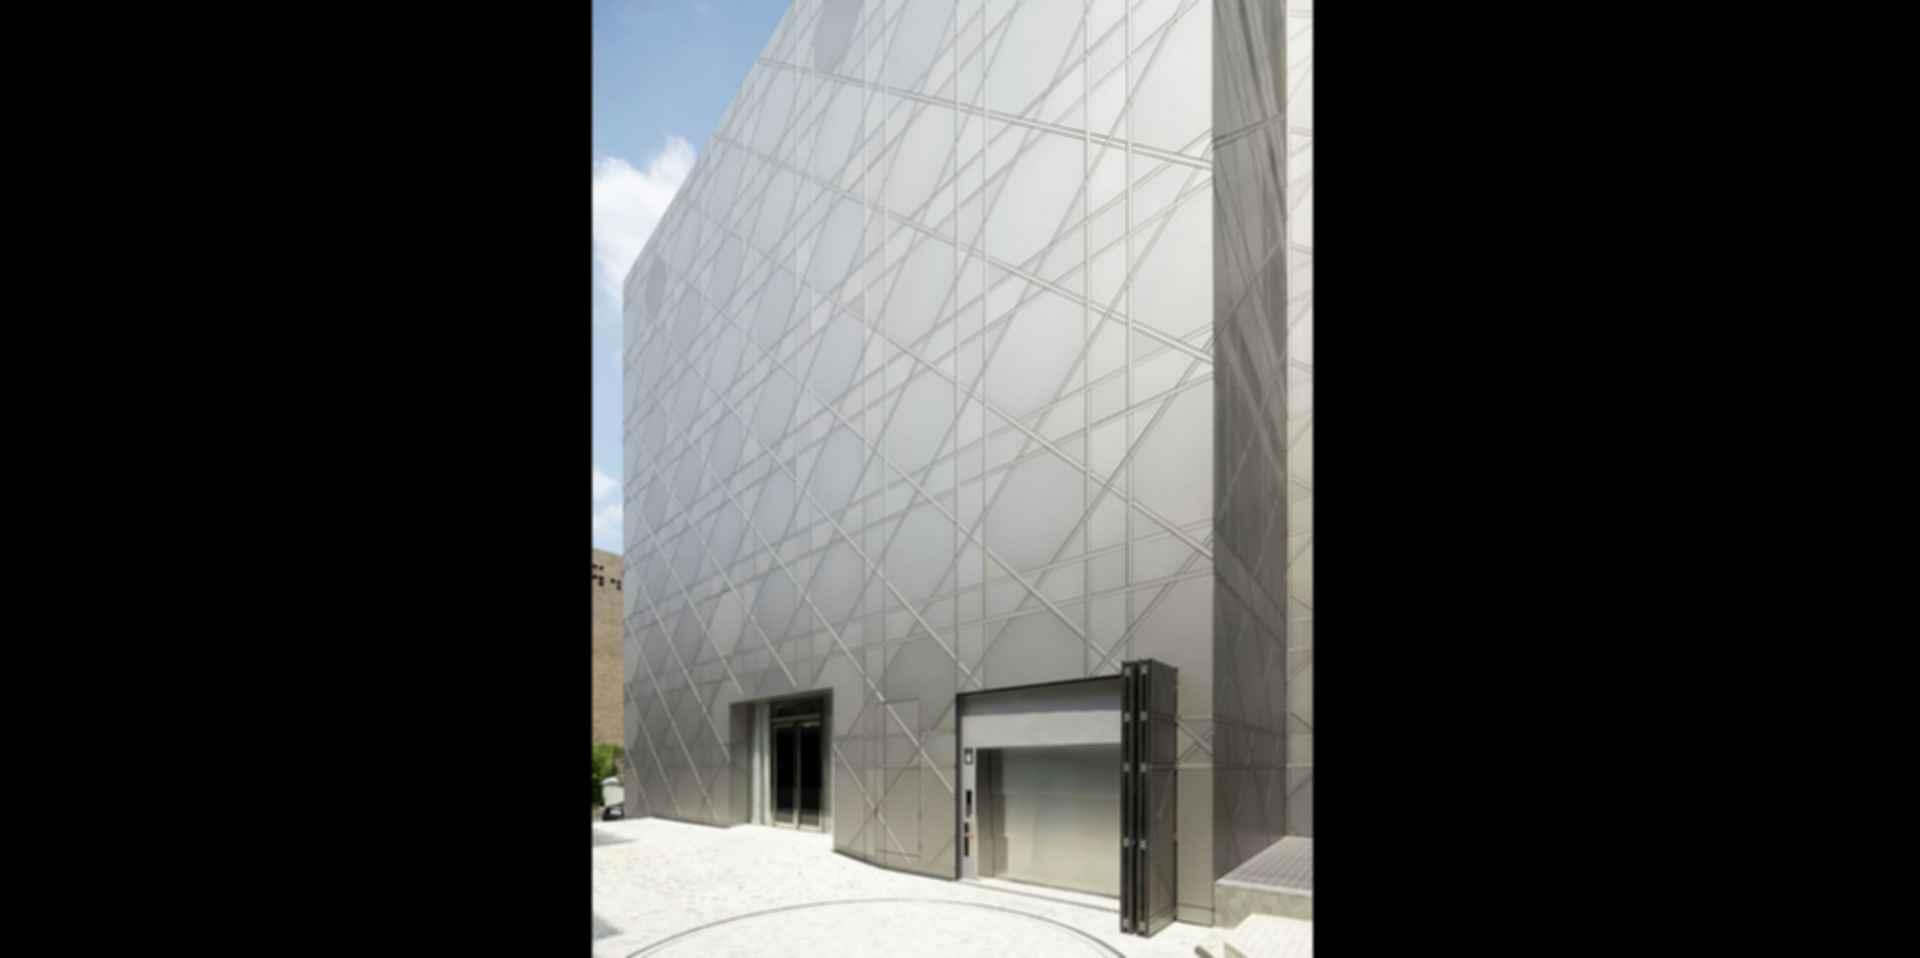 House of Dior - Exterior